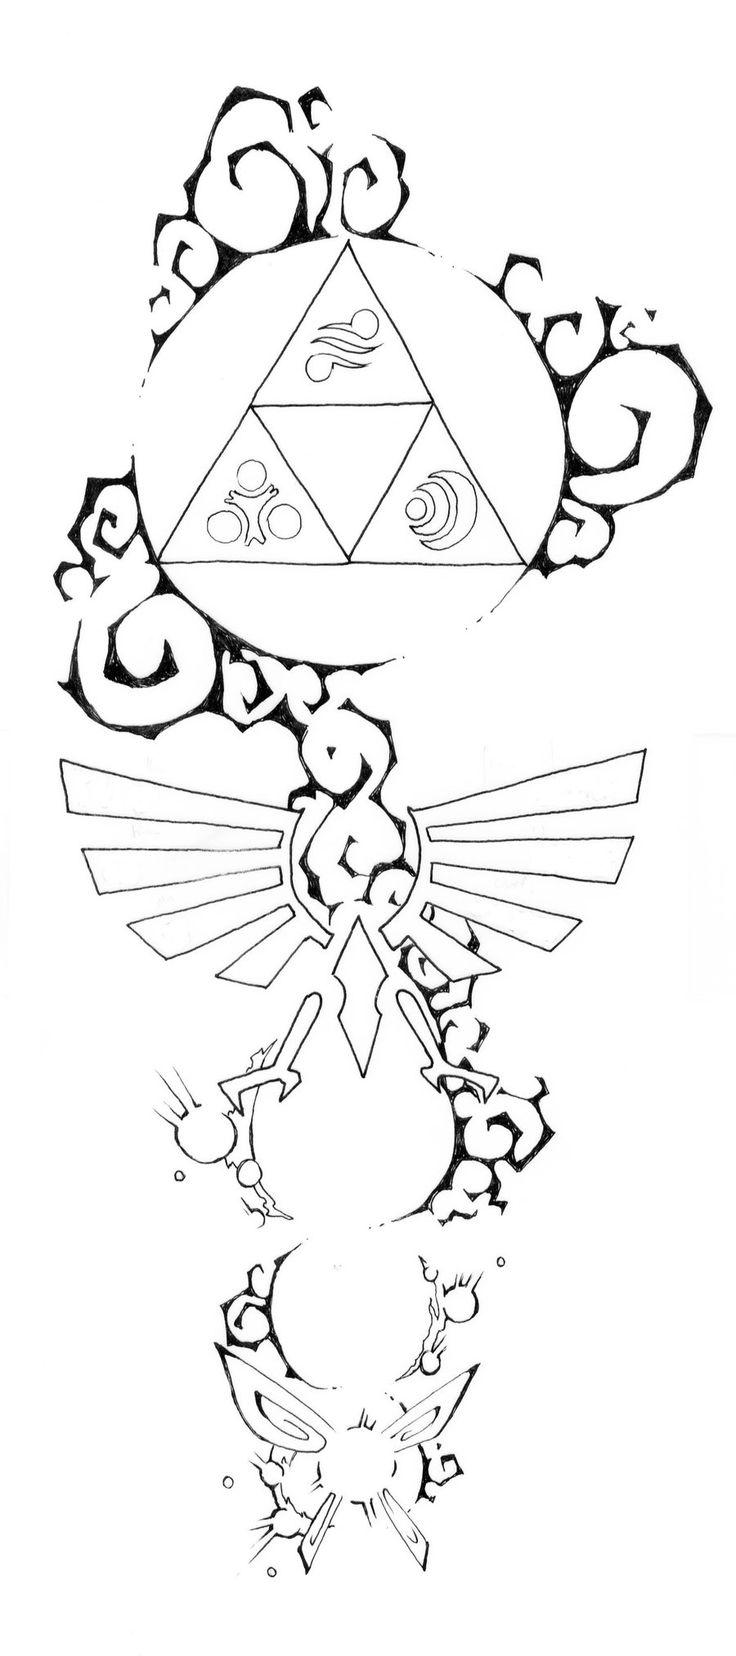 Zelda tattoo design #3 by blue-pepi.deviantart.com on @deviantART